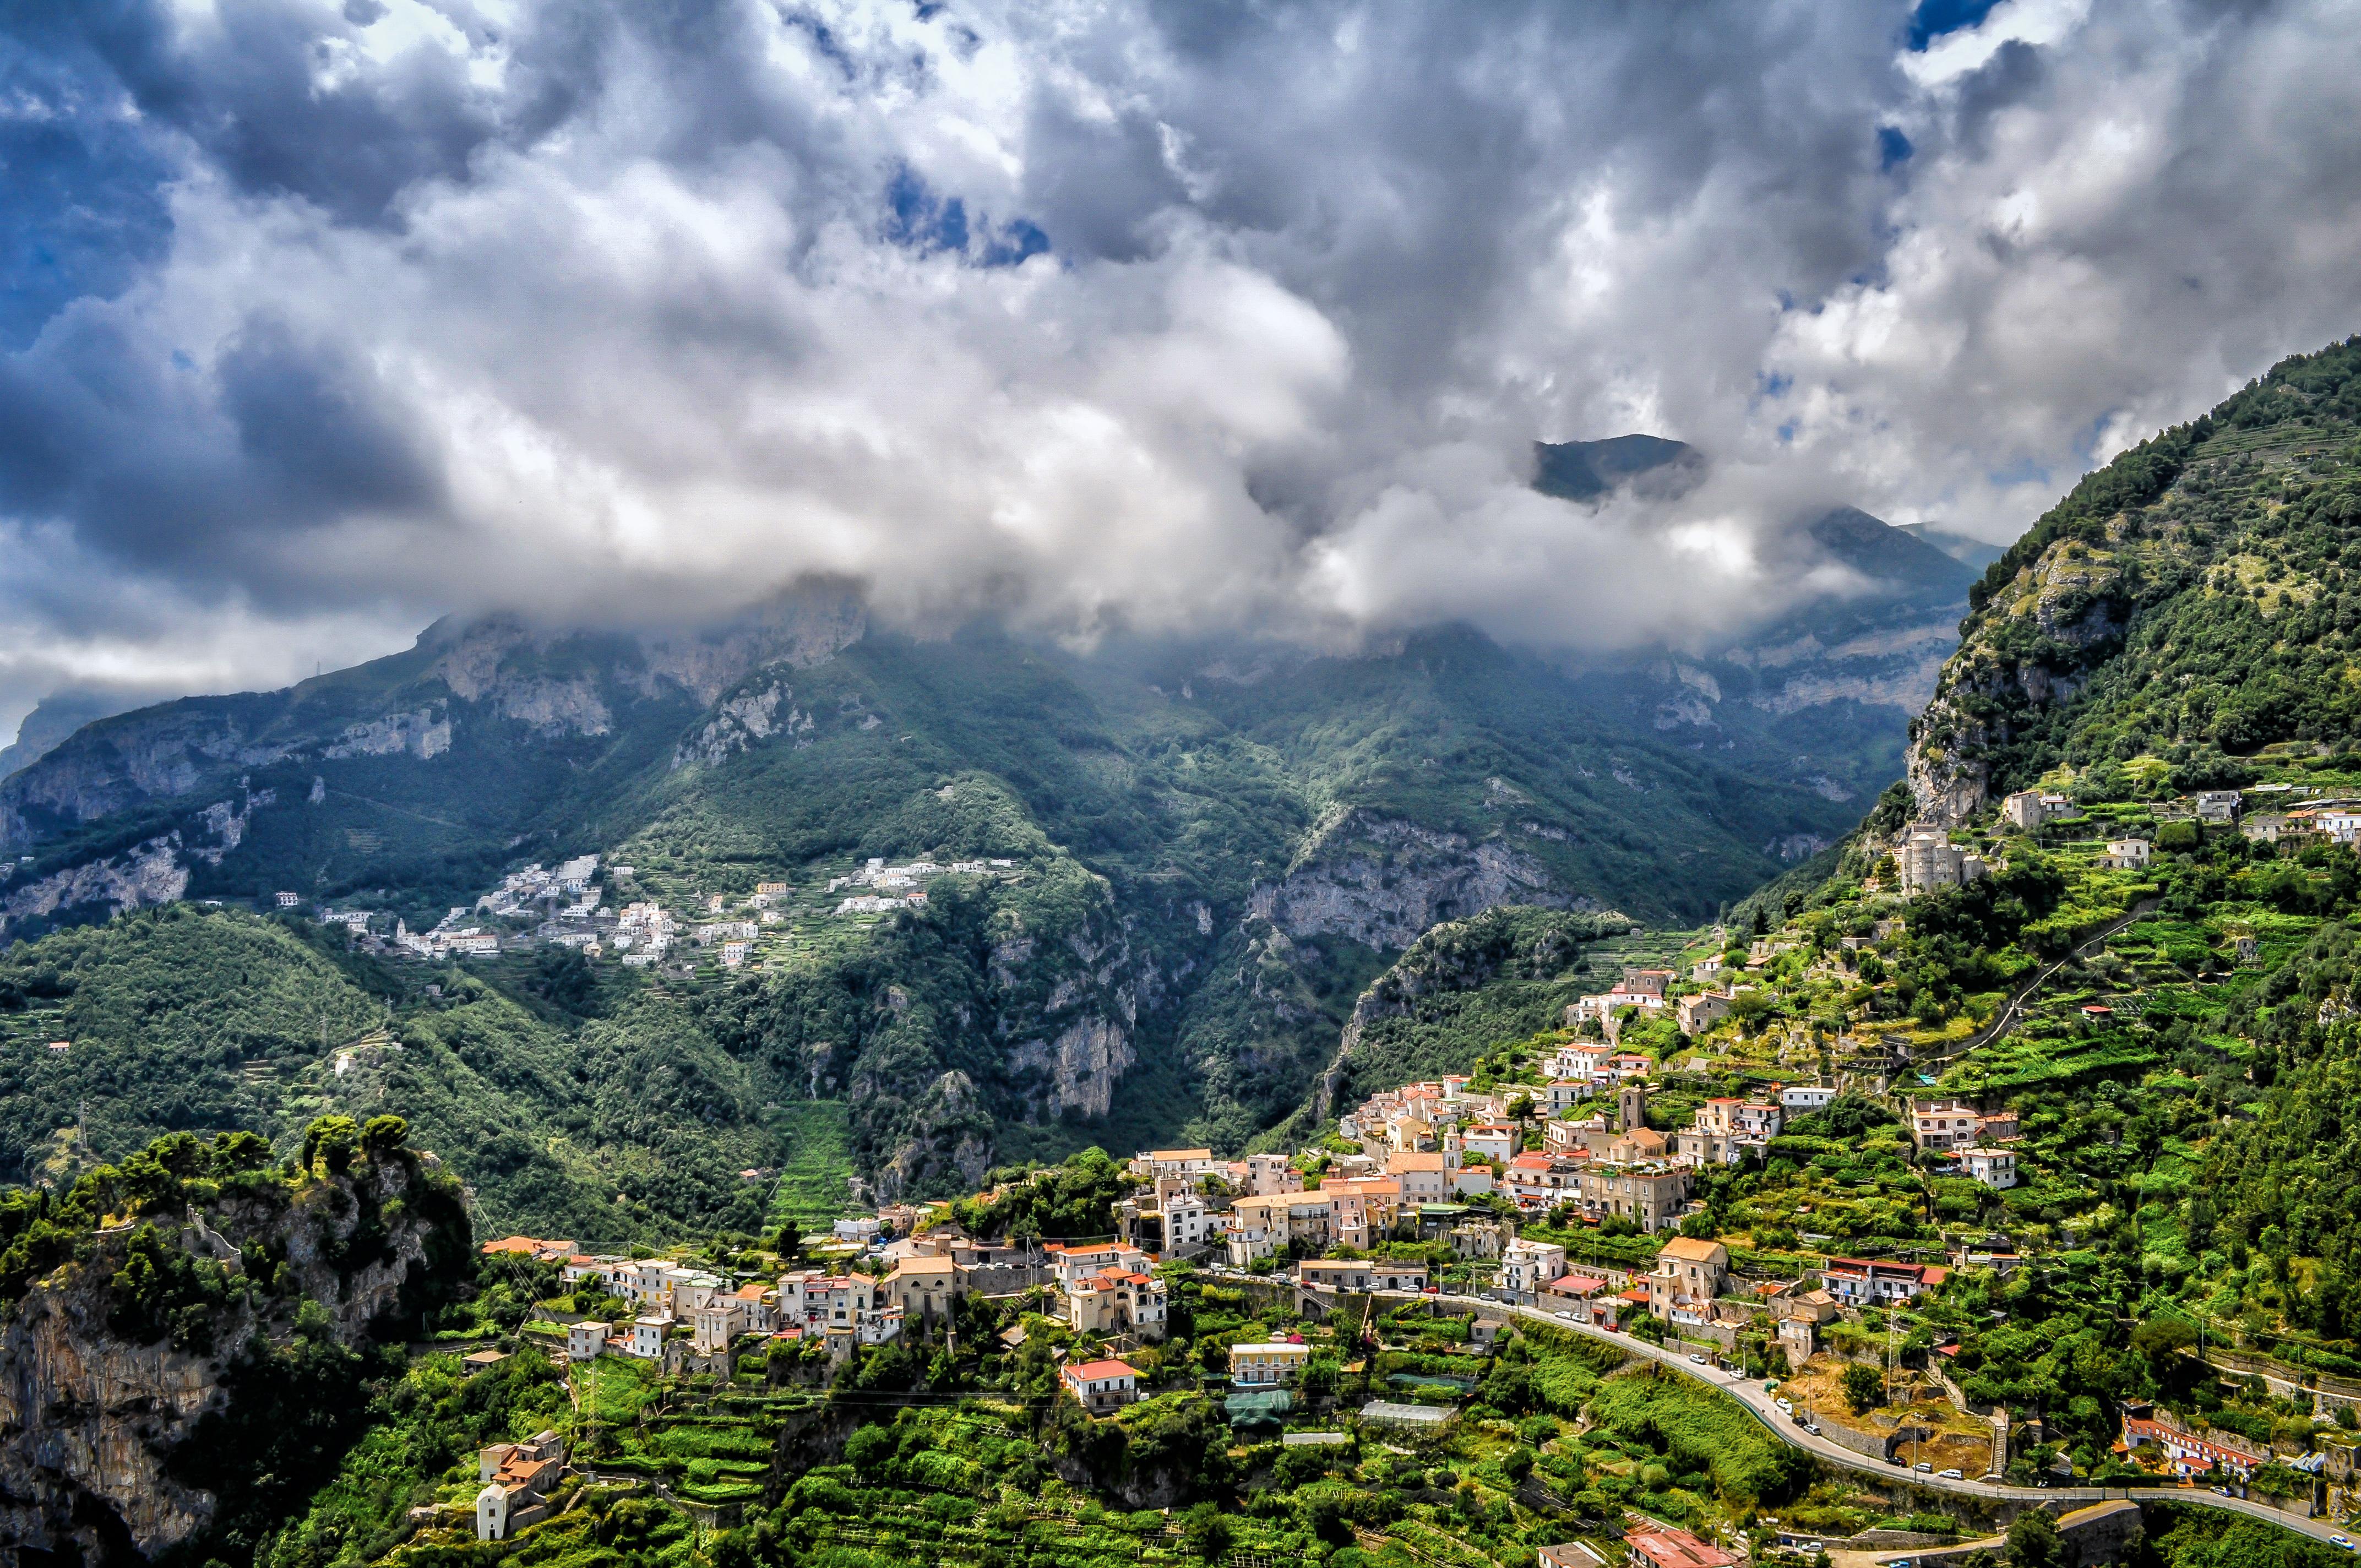 Италия, Amalfi, Italia